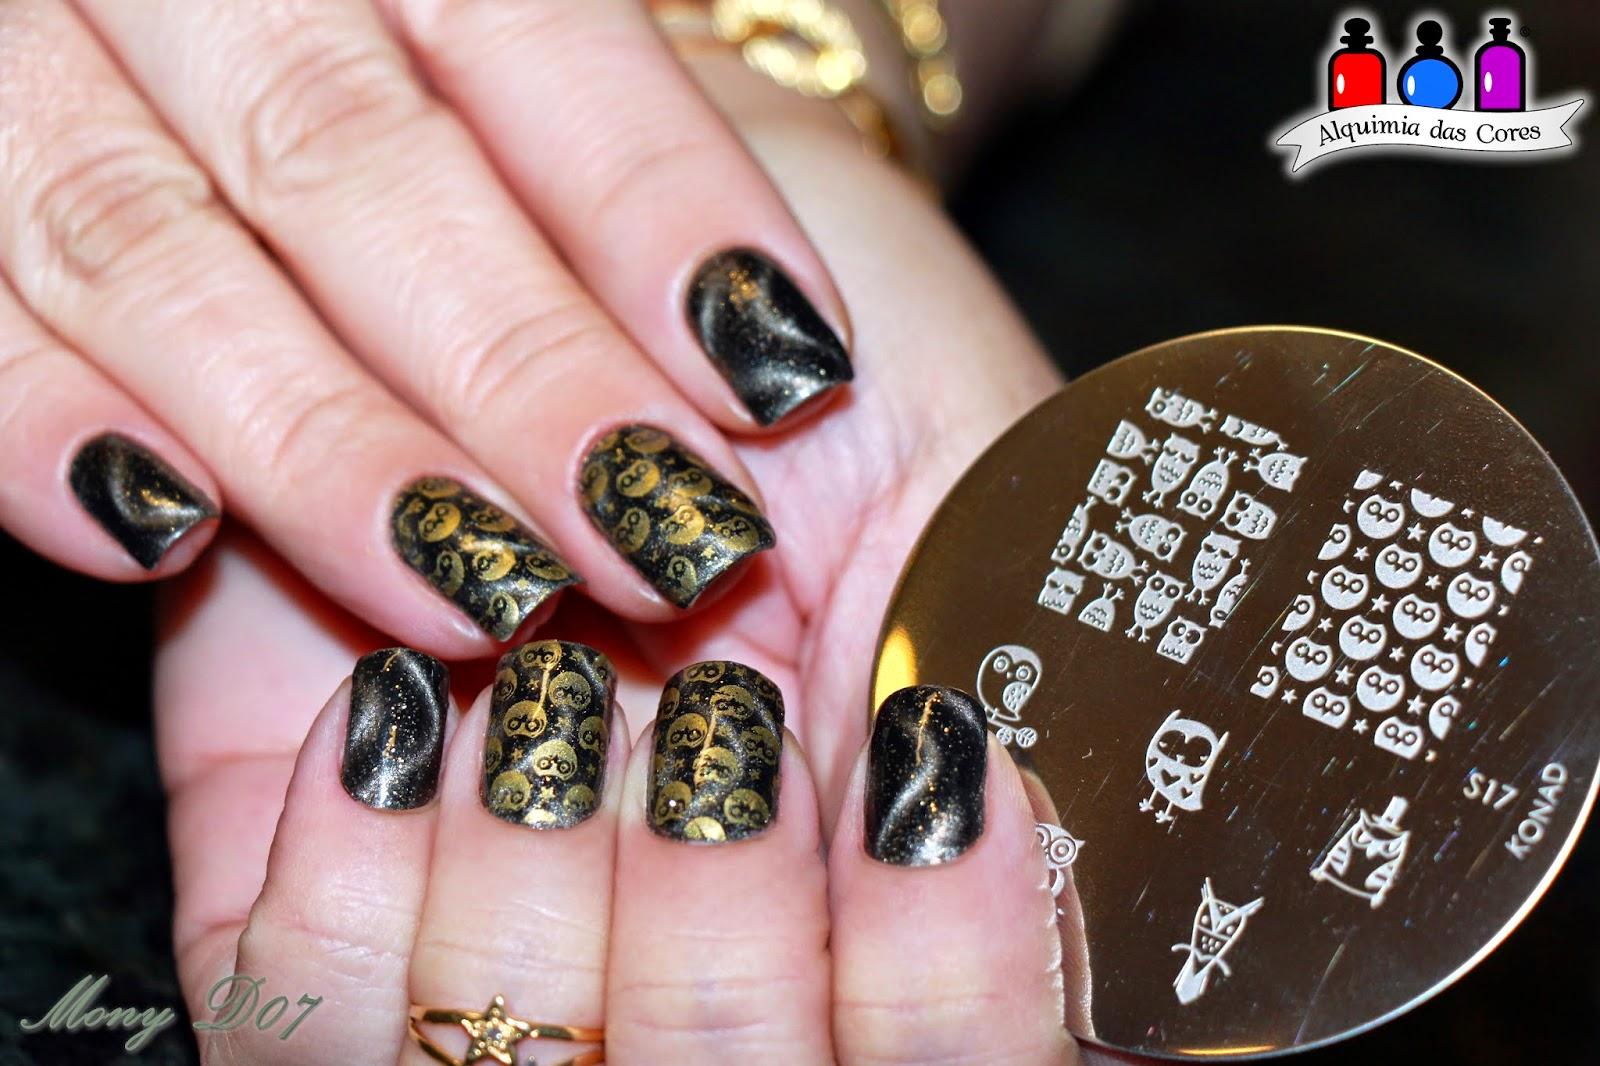 Layla, 24 Starry Night,  Magneffect, magnético, preto, verde,dourado, grafite, cinza,, Mony D07, Simoned07, esmalte, unhas, esmaltação.mani, manicure